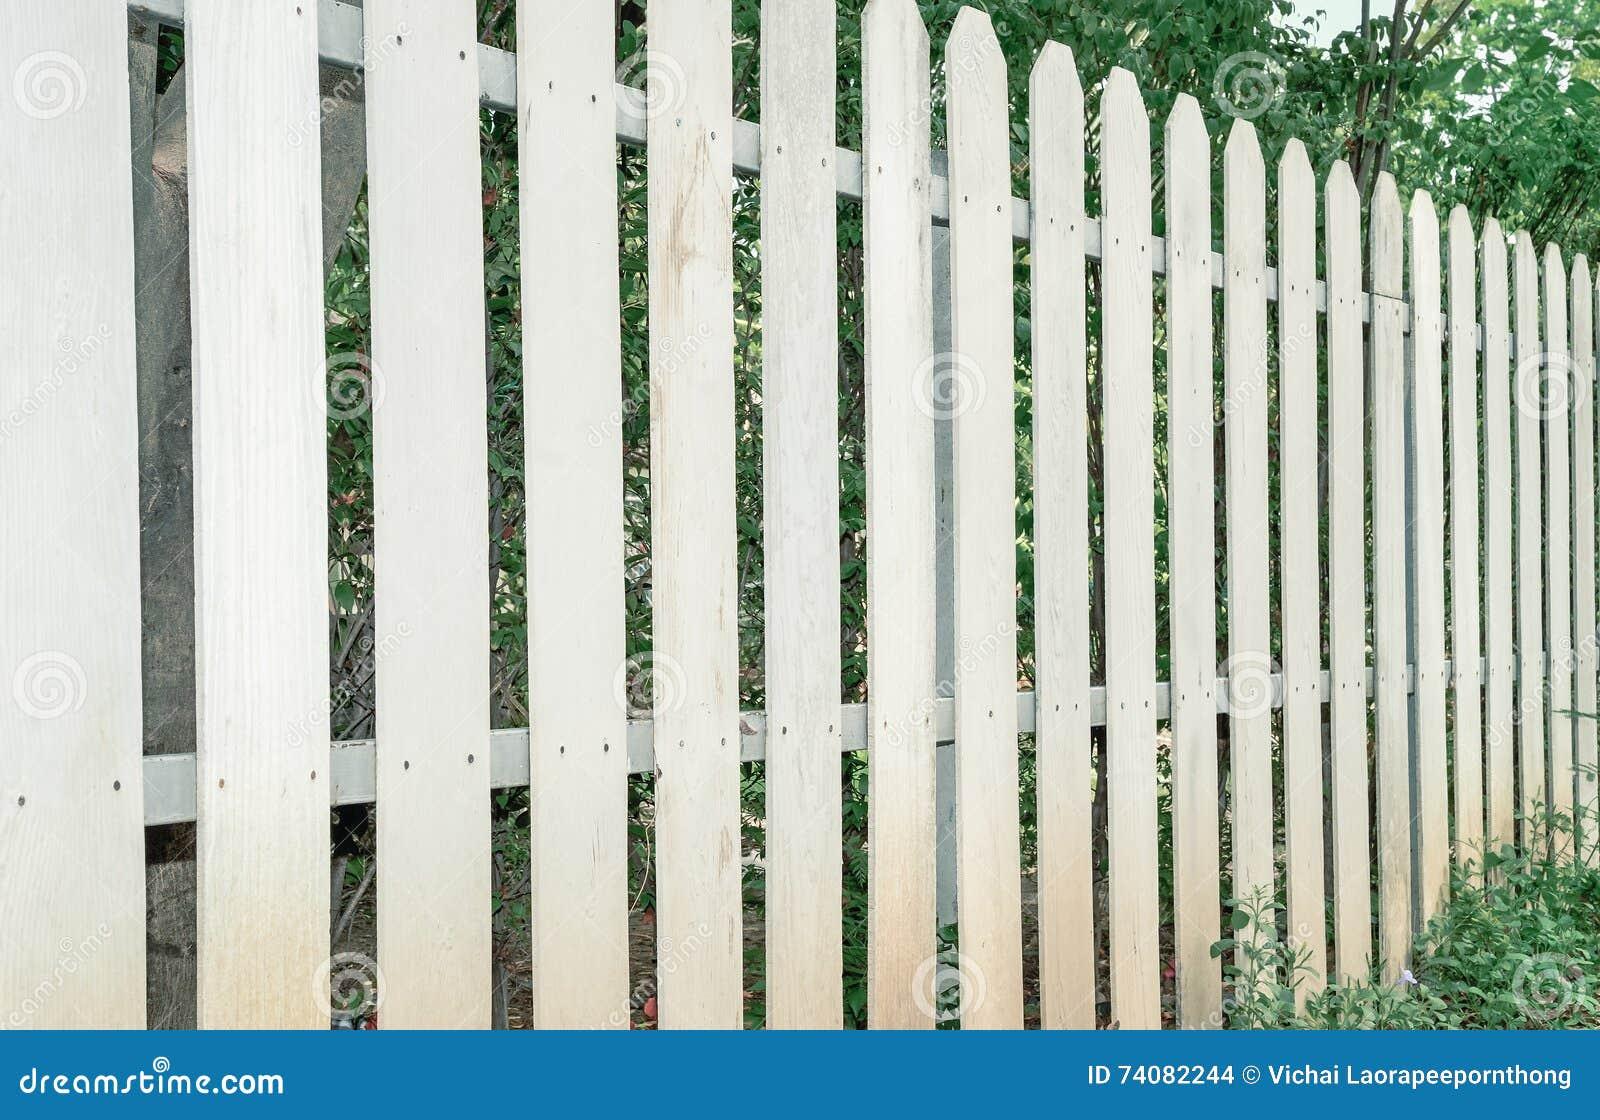 rustic wood fence background home gardens geek Idealvistalistco